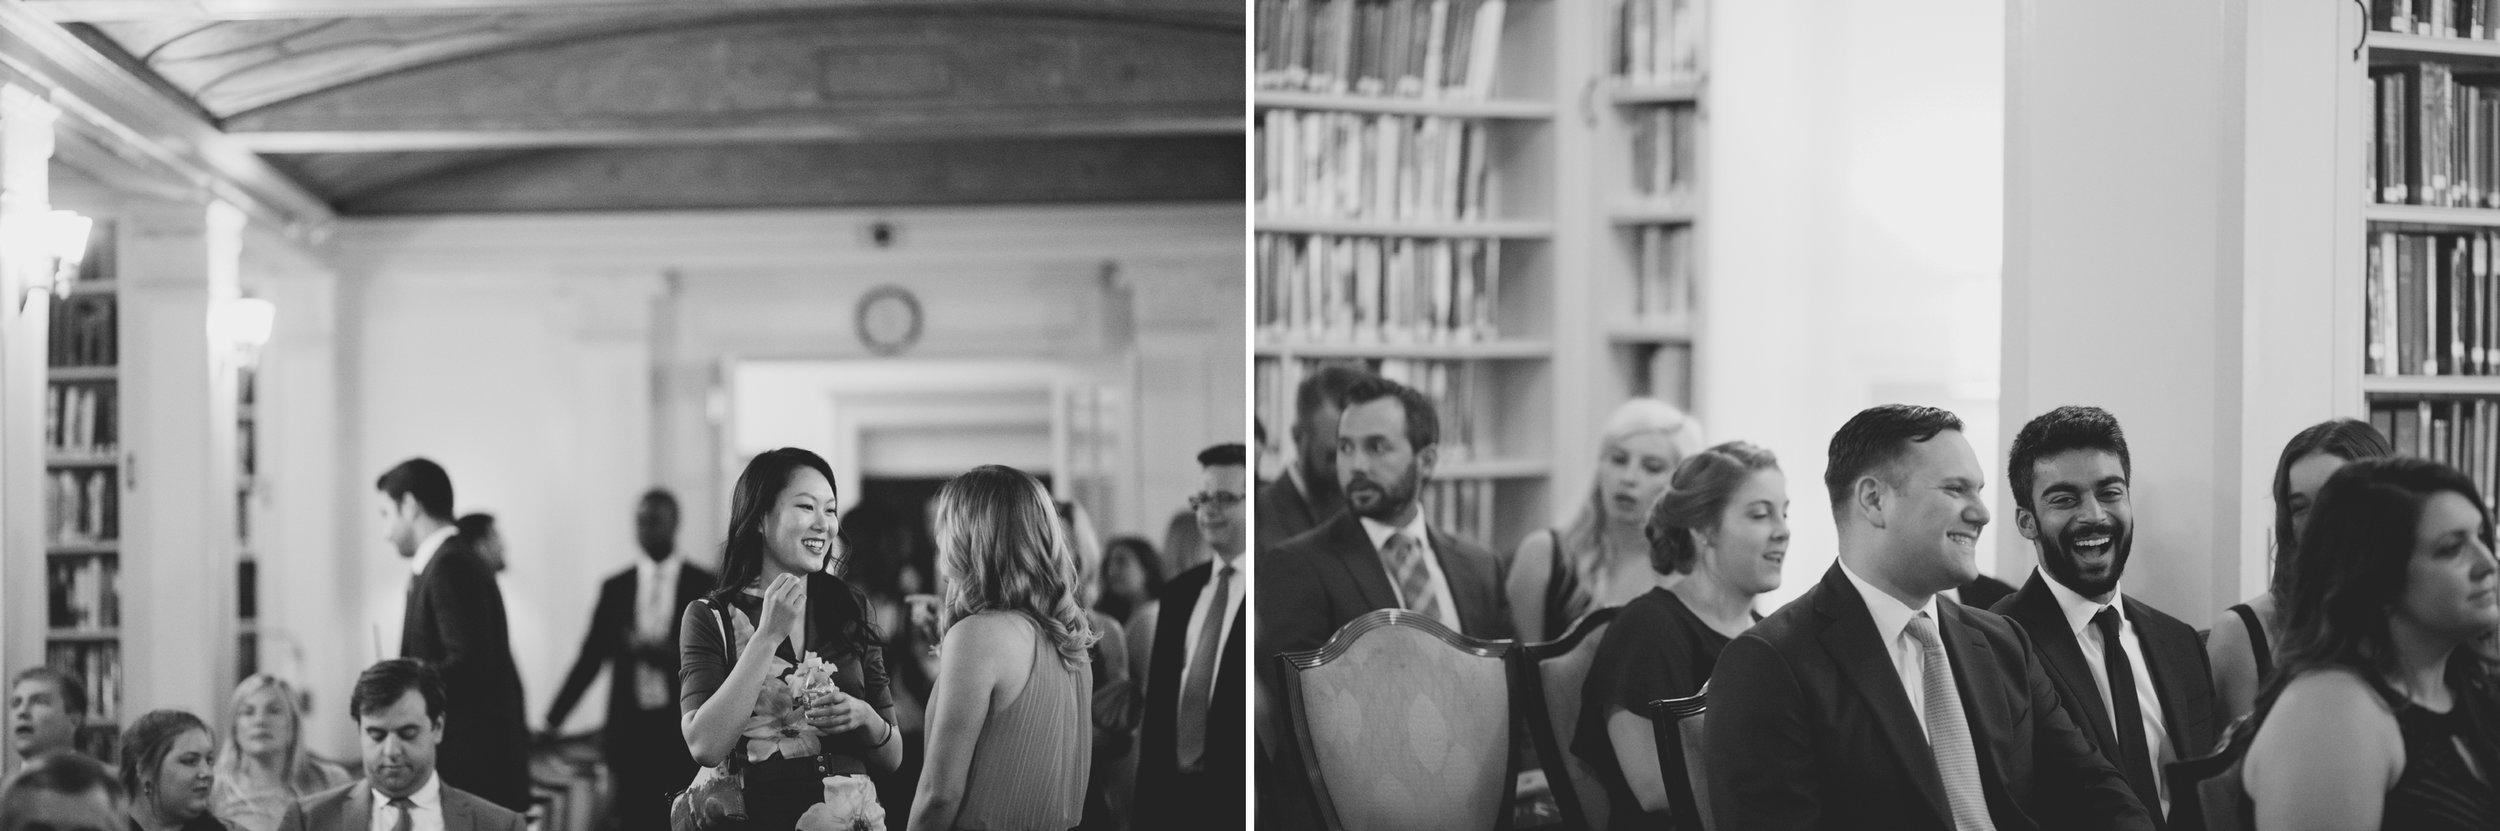 amanda_vanvels_new_york_lgbtq_gay_wedding_048.jpg